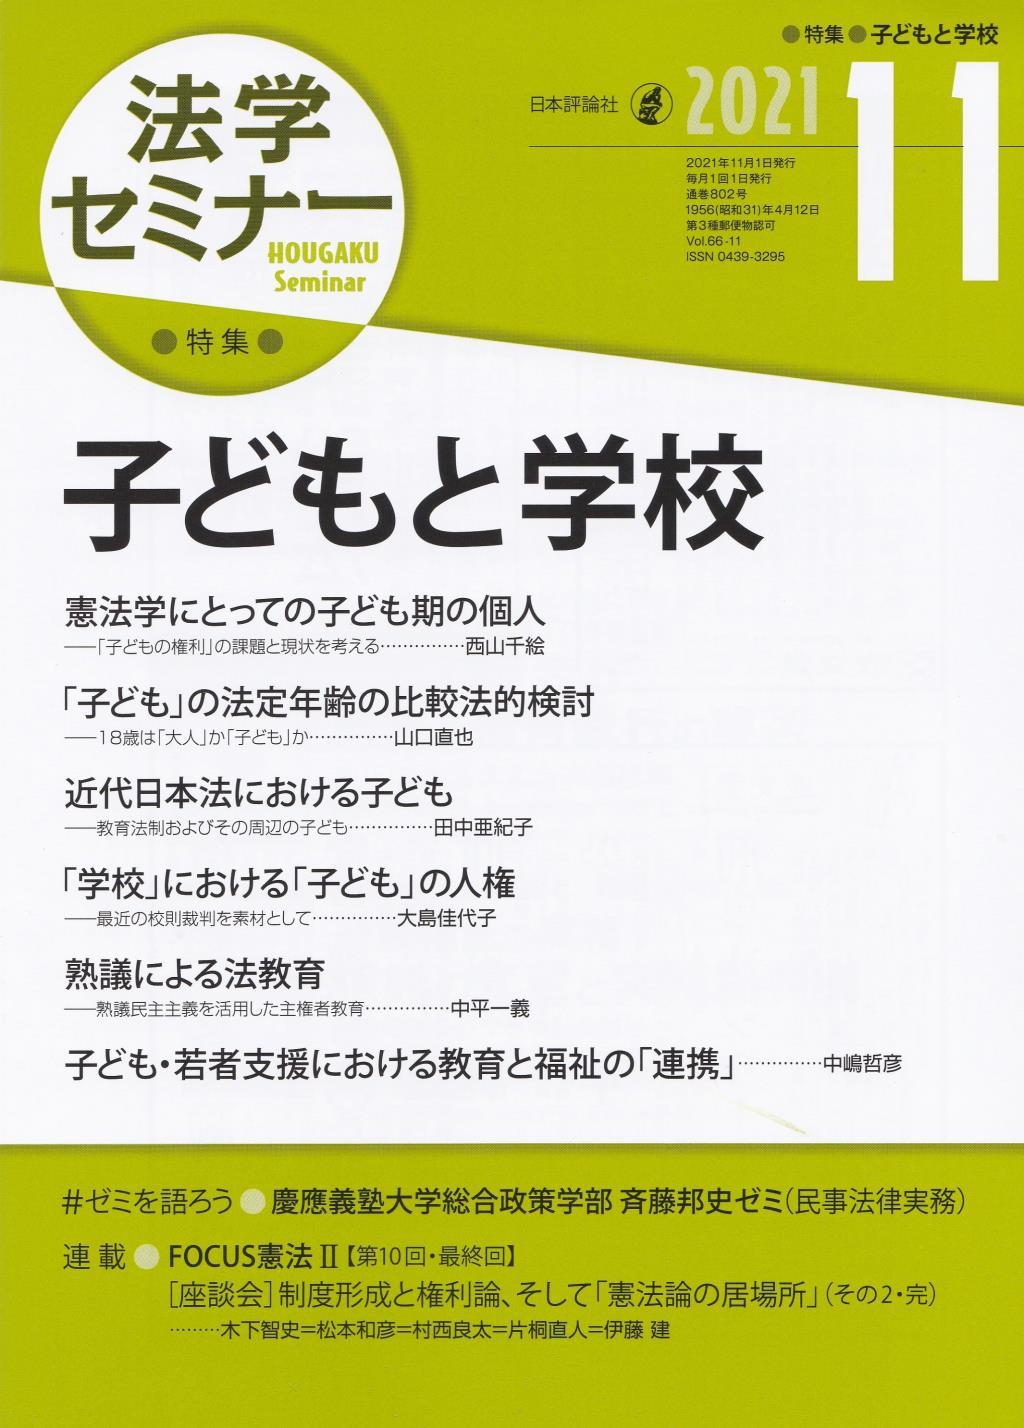 法学セミナー 2021年11月号 第66巻11号 通巻802号